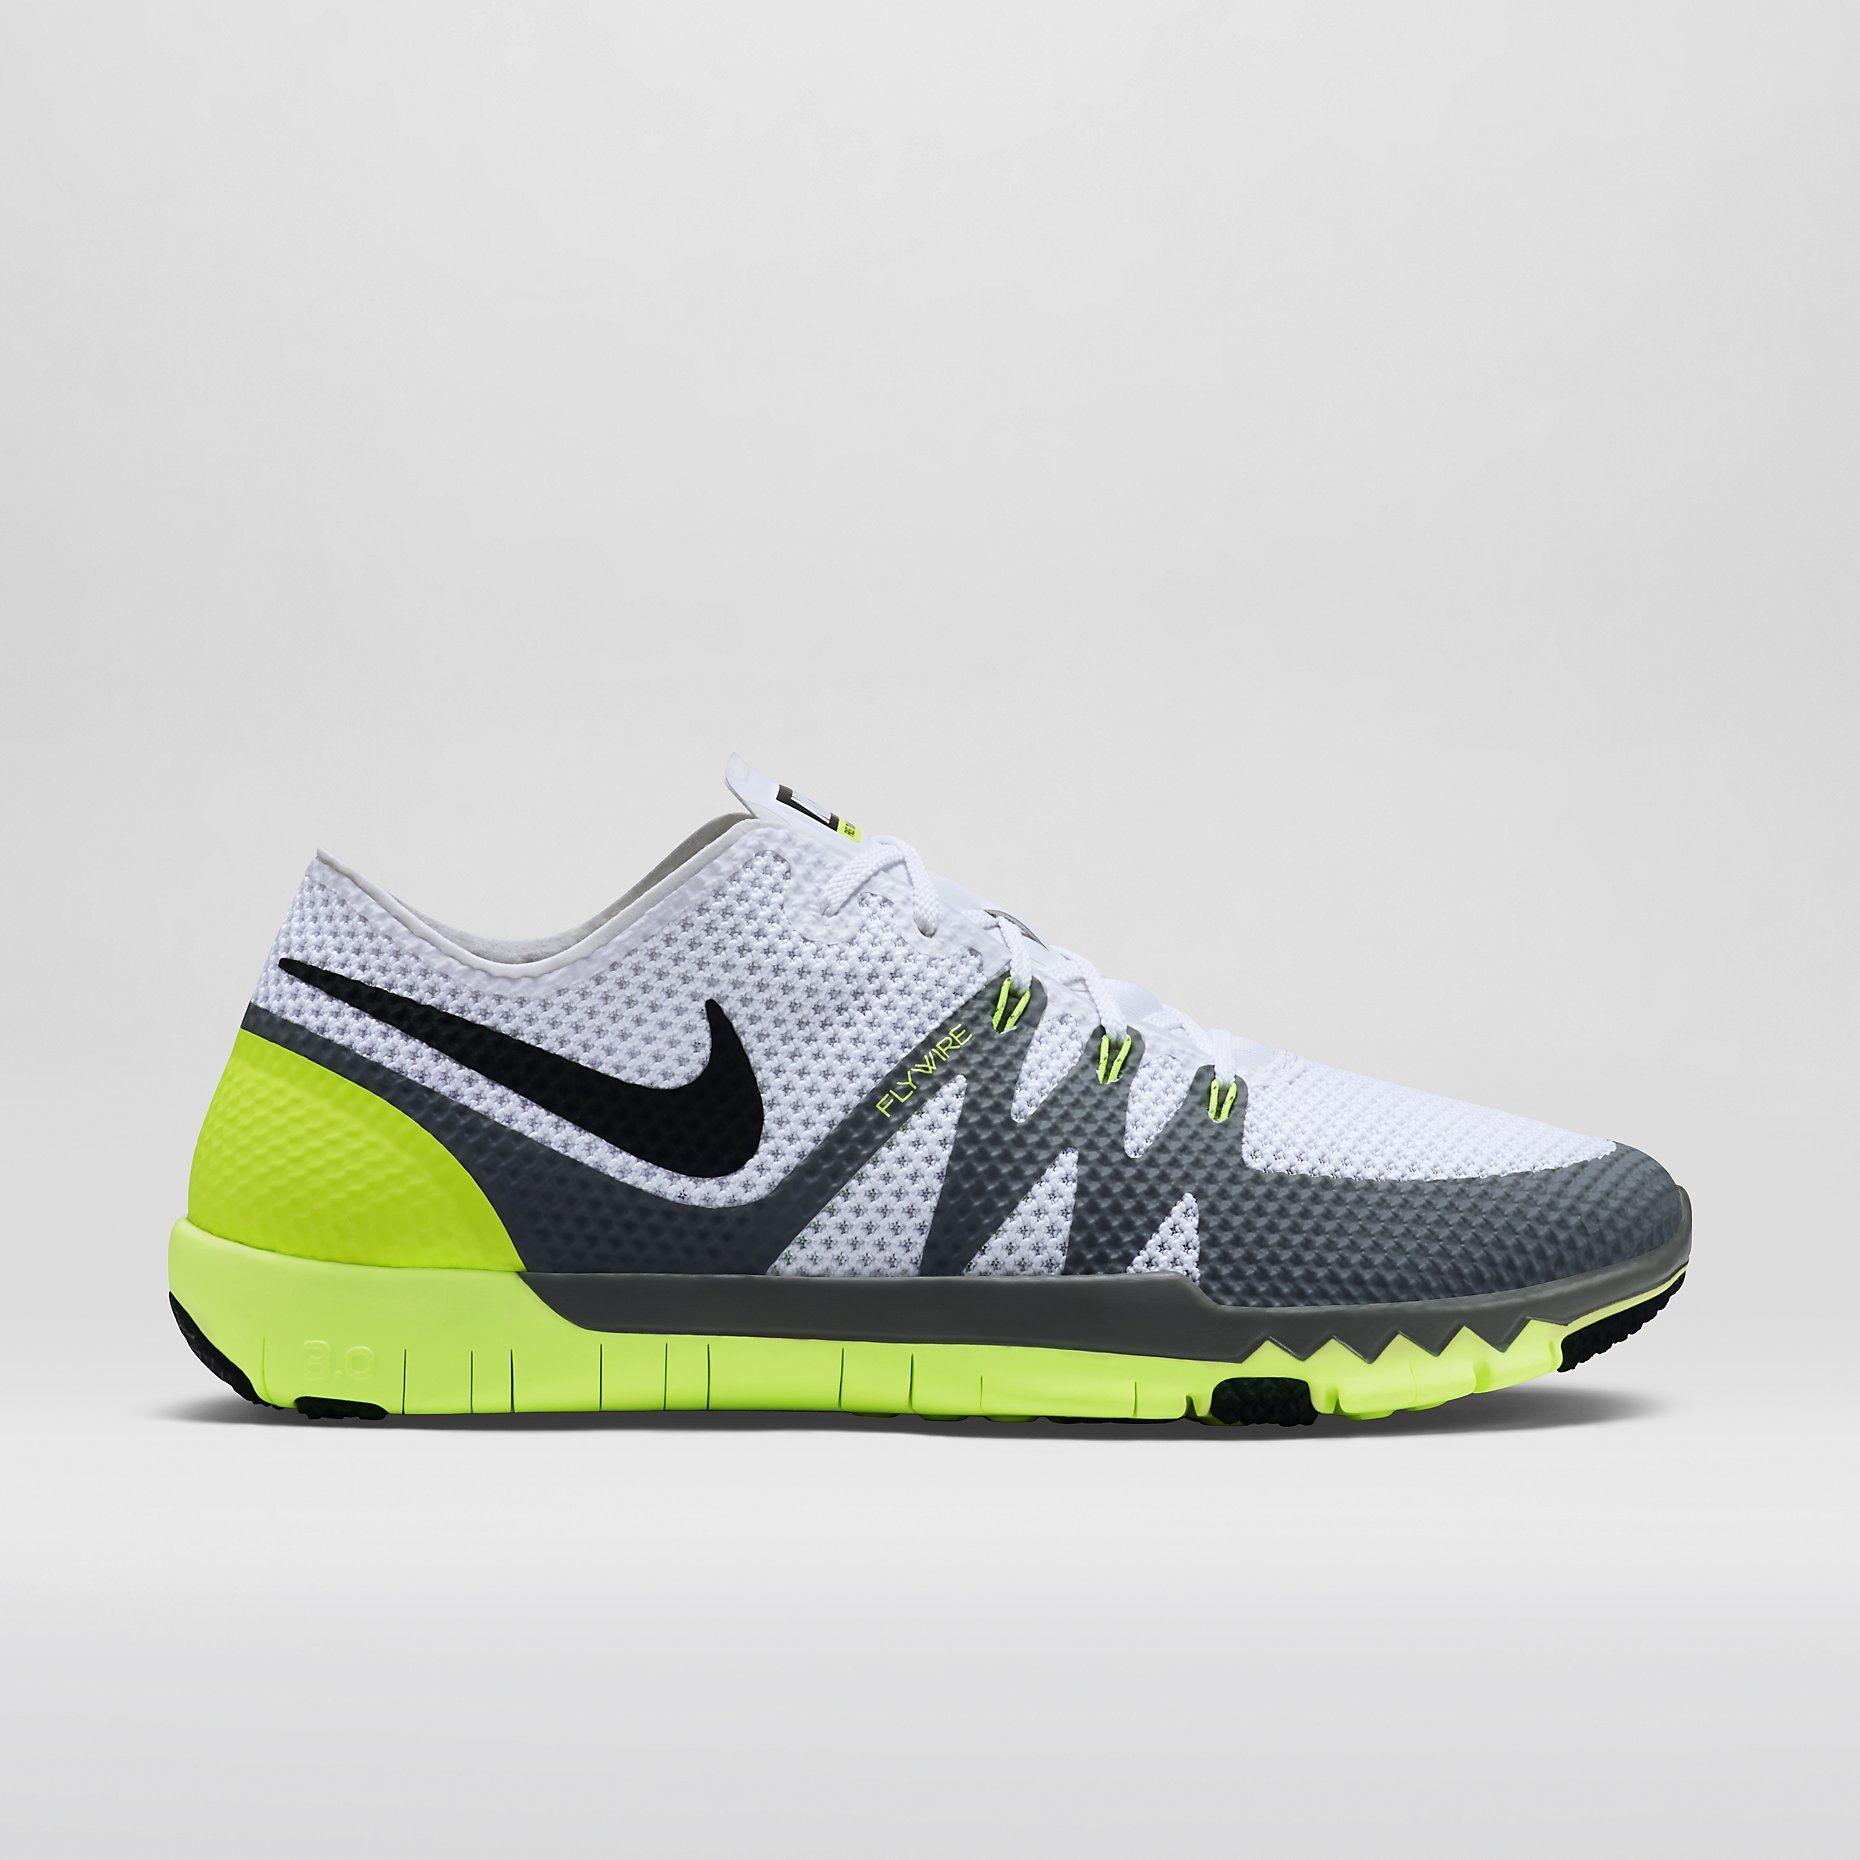 Scarpa da training Nike Free Trainer 3.0 V3 Uomo. Nike